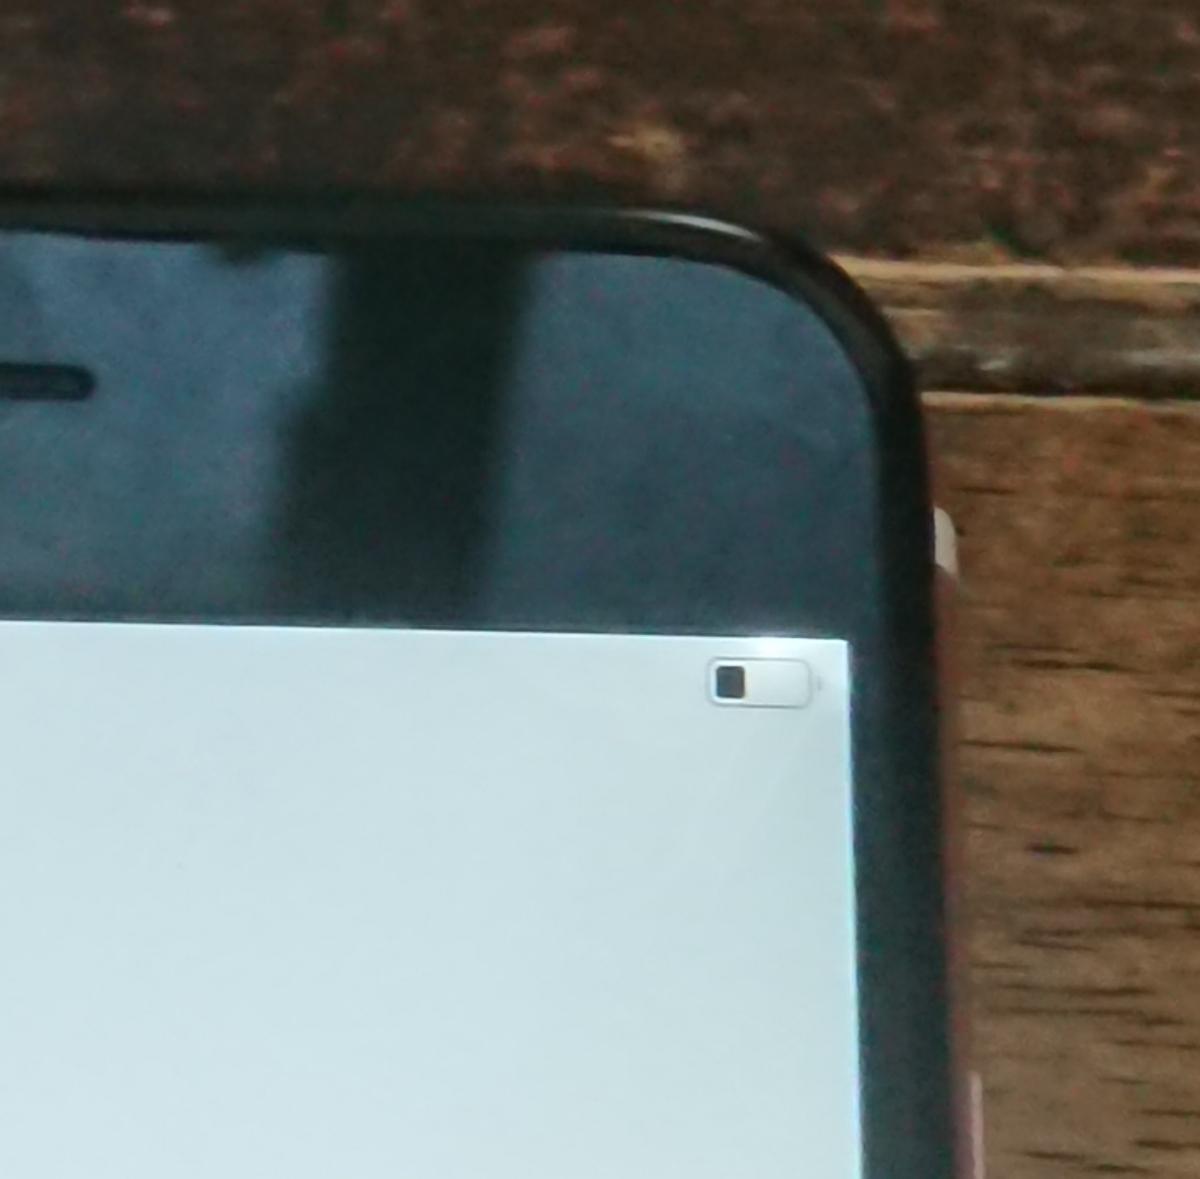 iPhone6s用Apple純正液晶パネル/フロントパネル軽度光漏れジャンク品扱いA_画像2